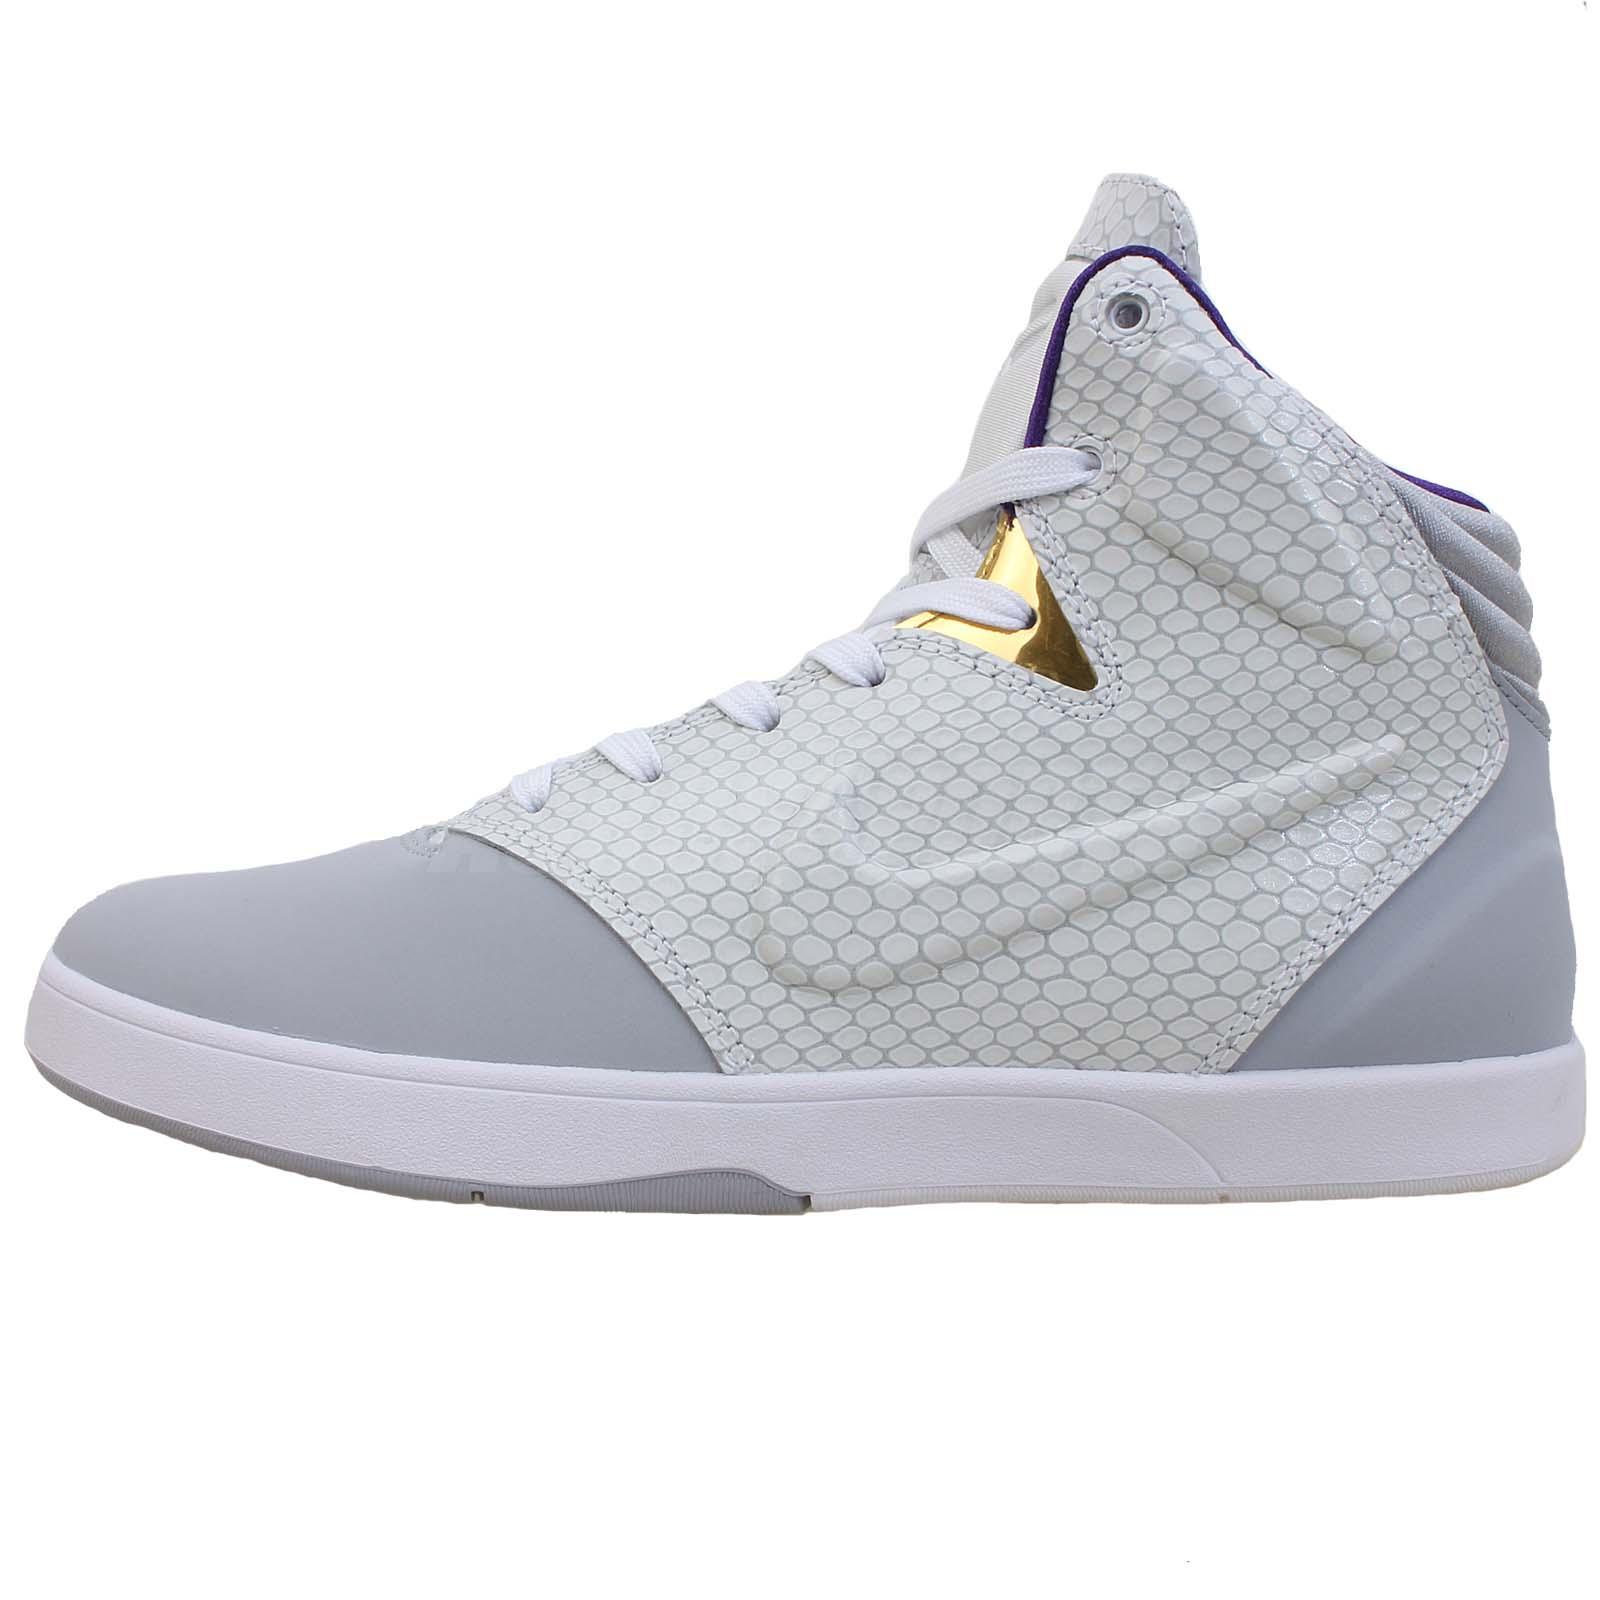 Nike Kobe 9 NSW Lifestyle 2014 Snake Mamba Bryant Gold